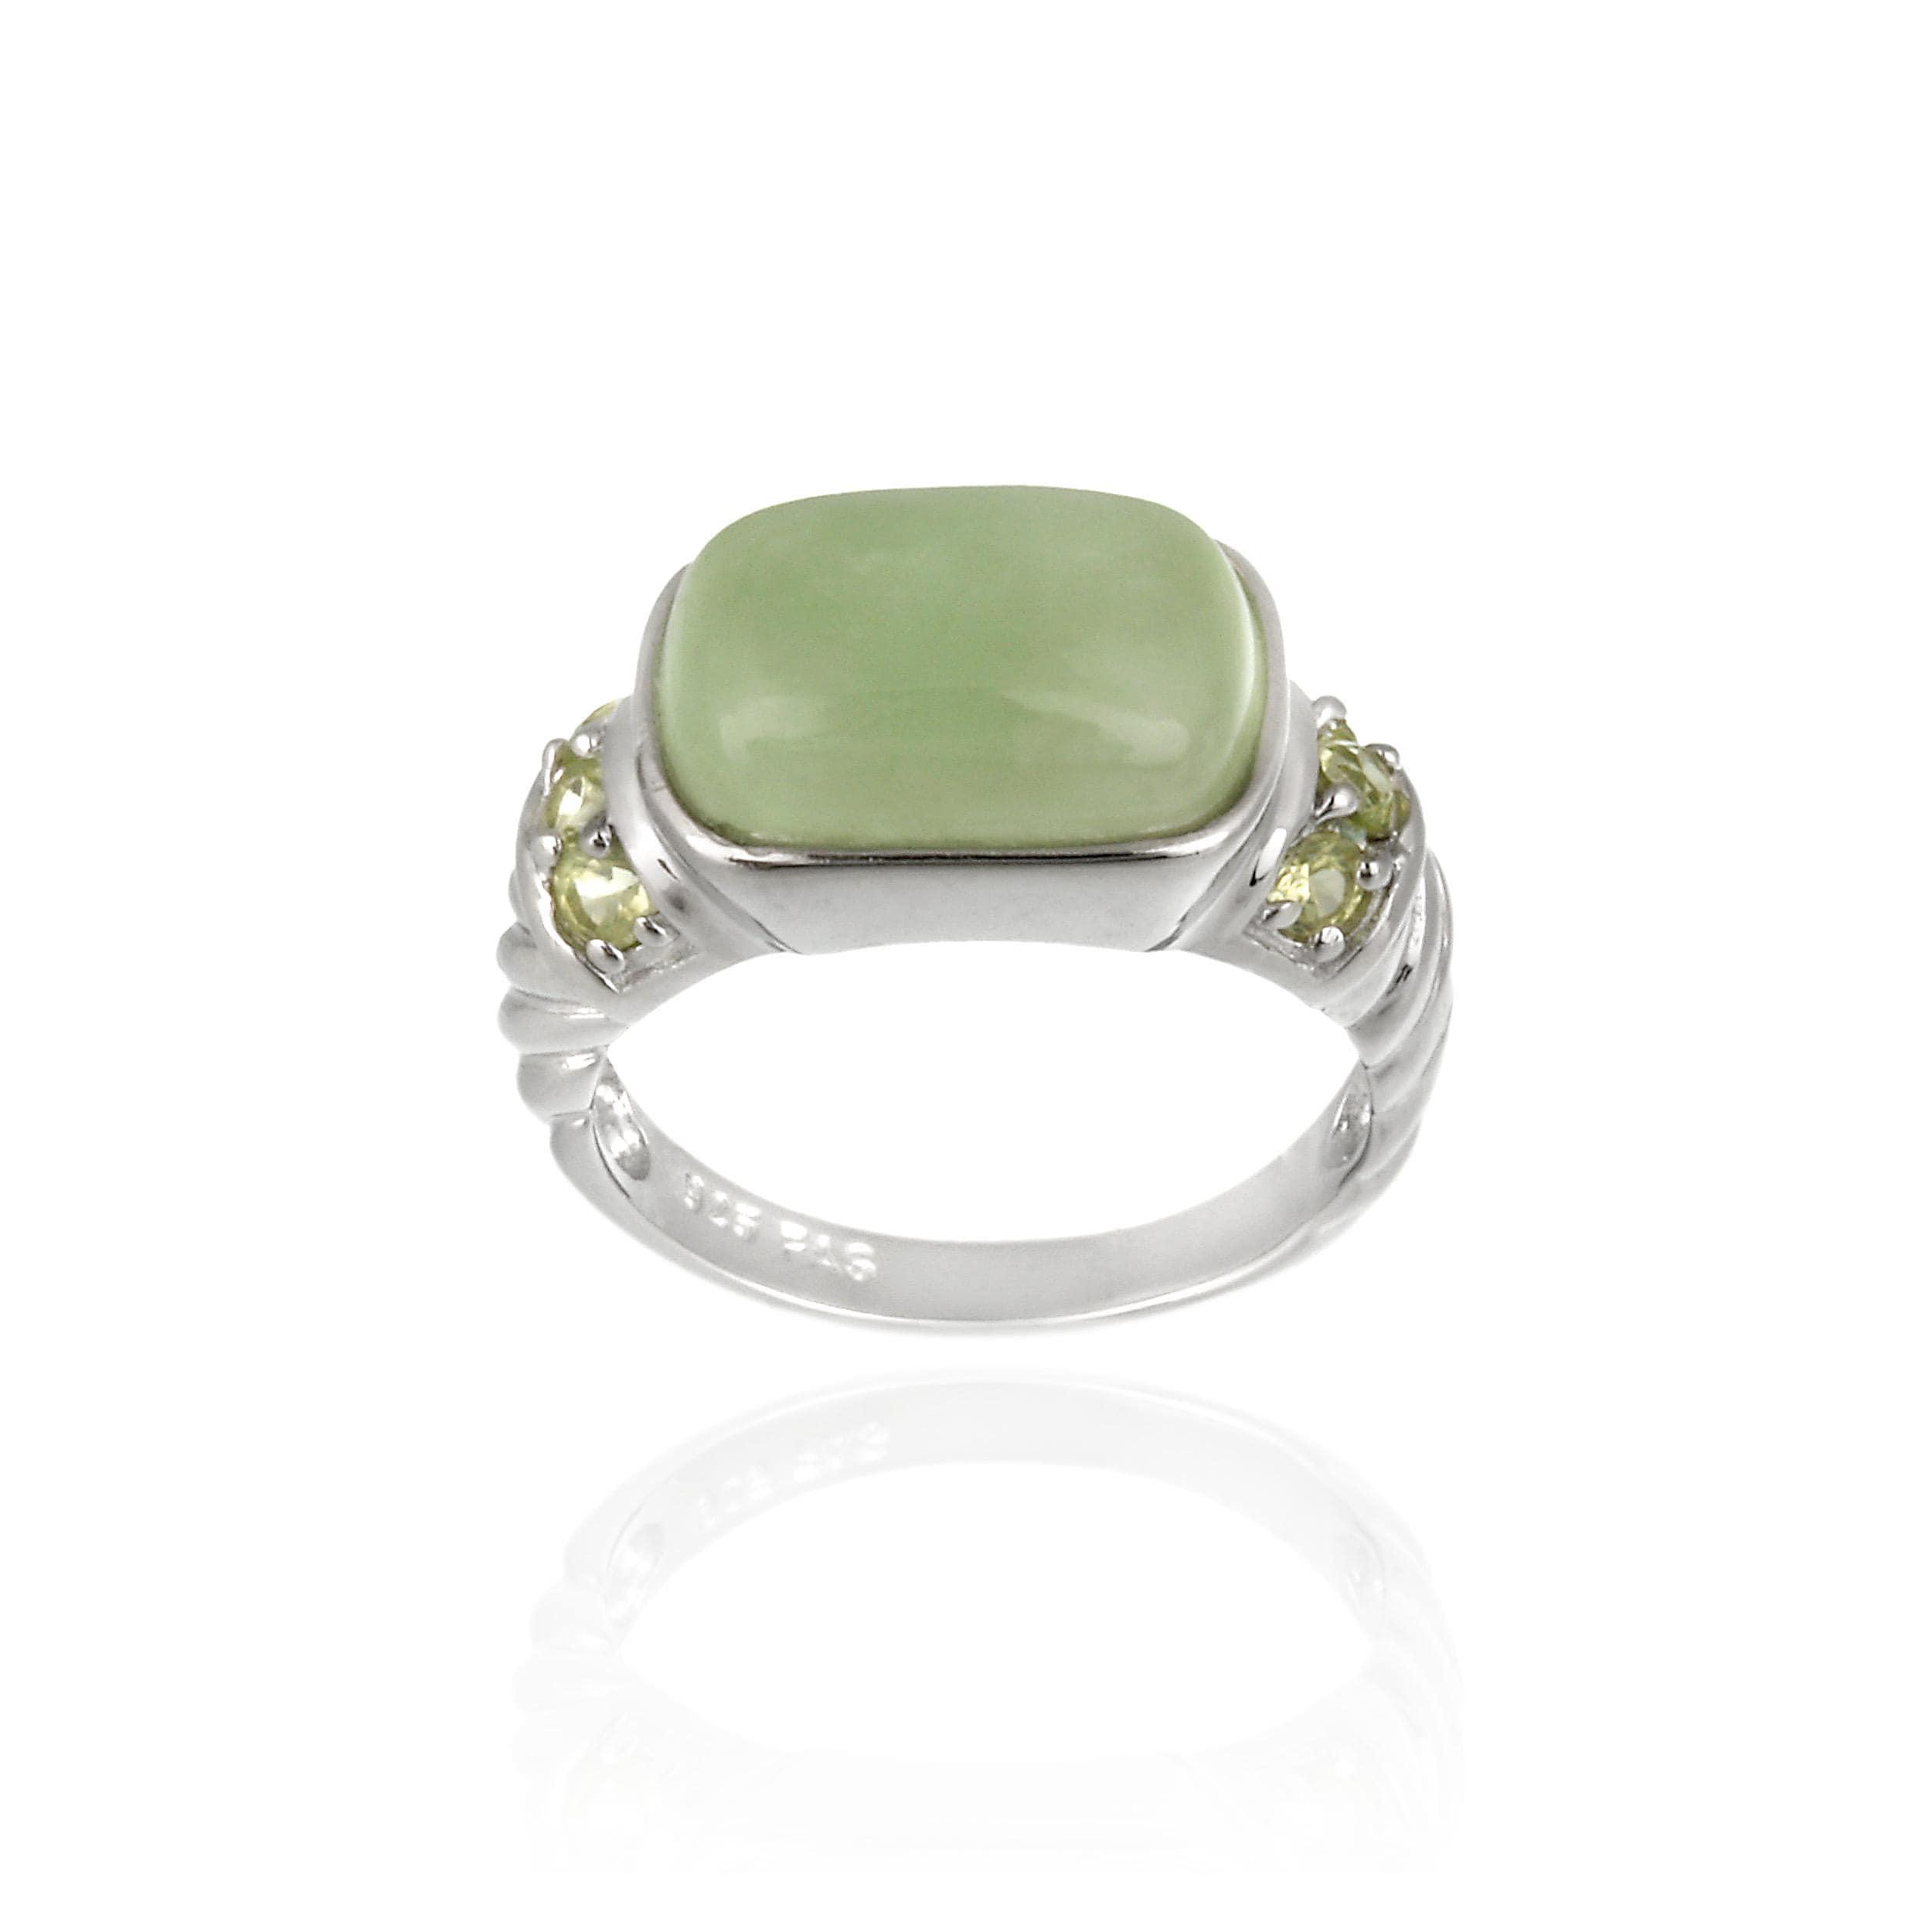 Glitzy Rocks Sterling Silver Green Jade and Peridot Ring Free Shipping O